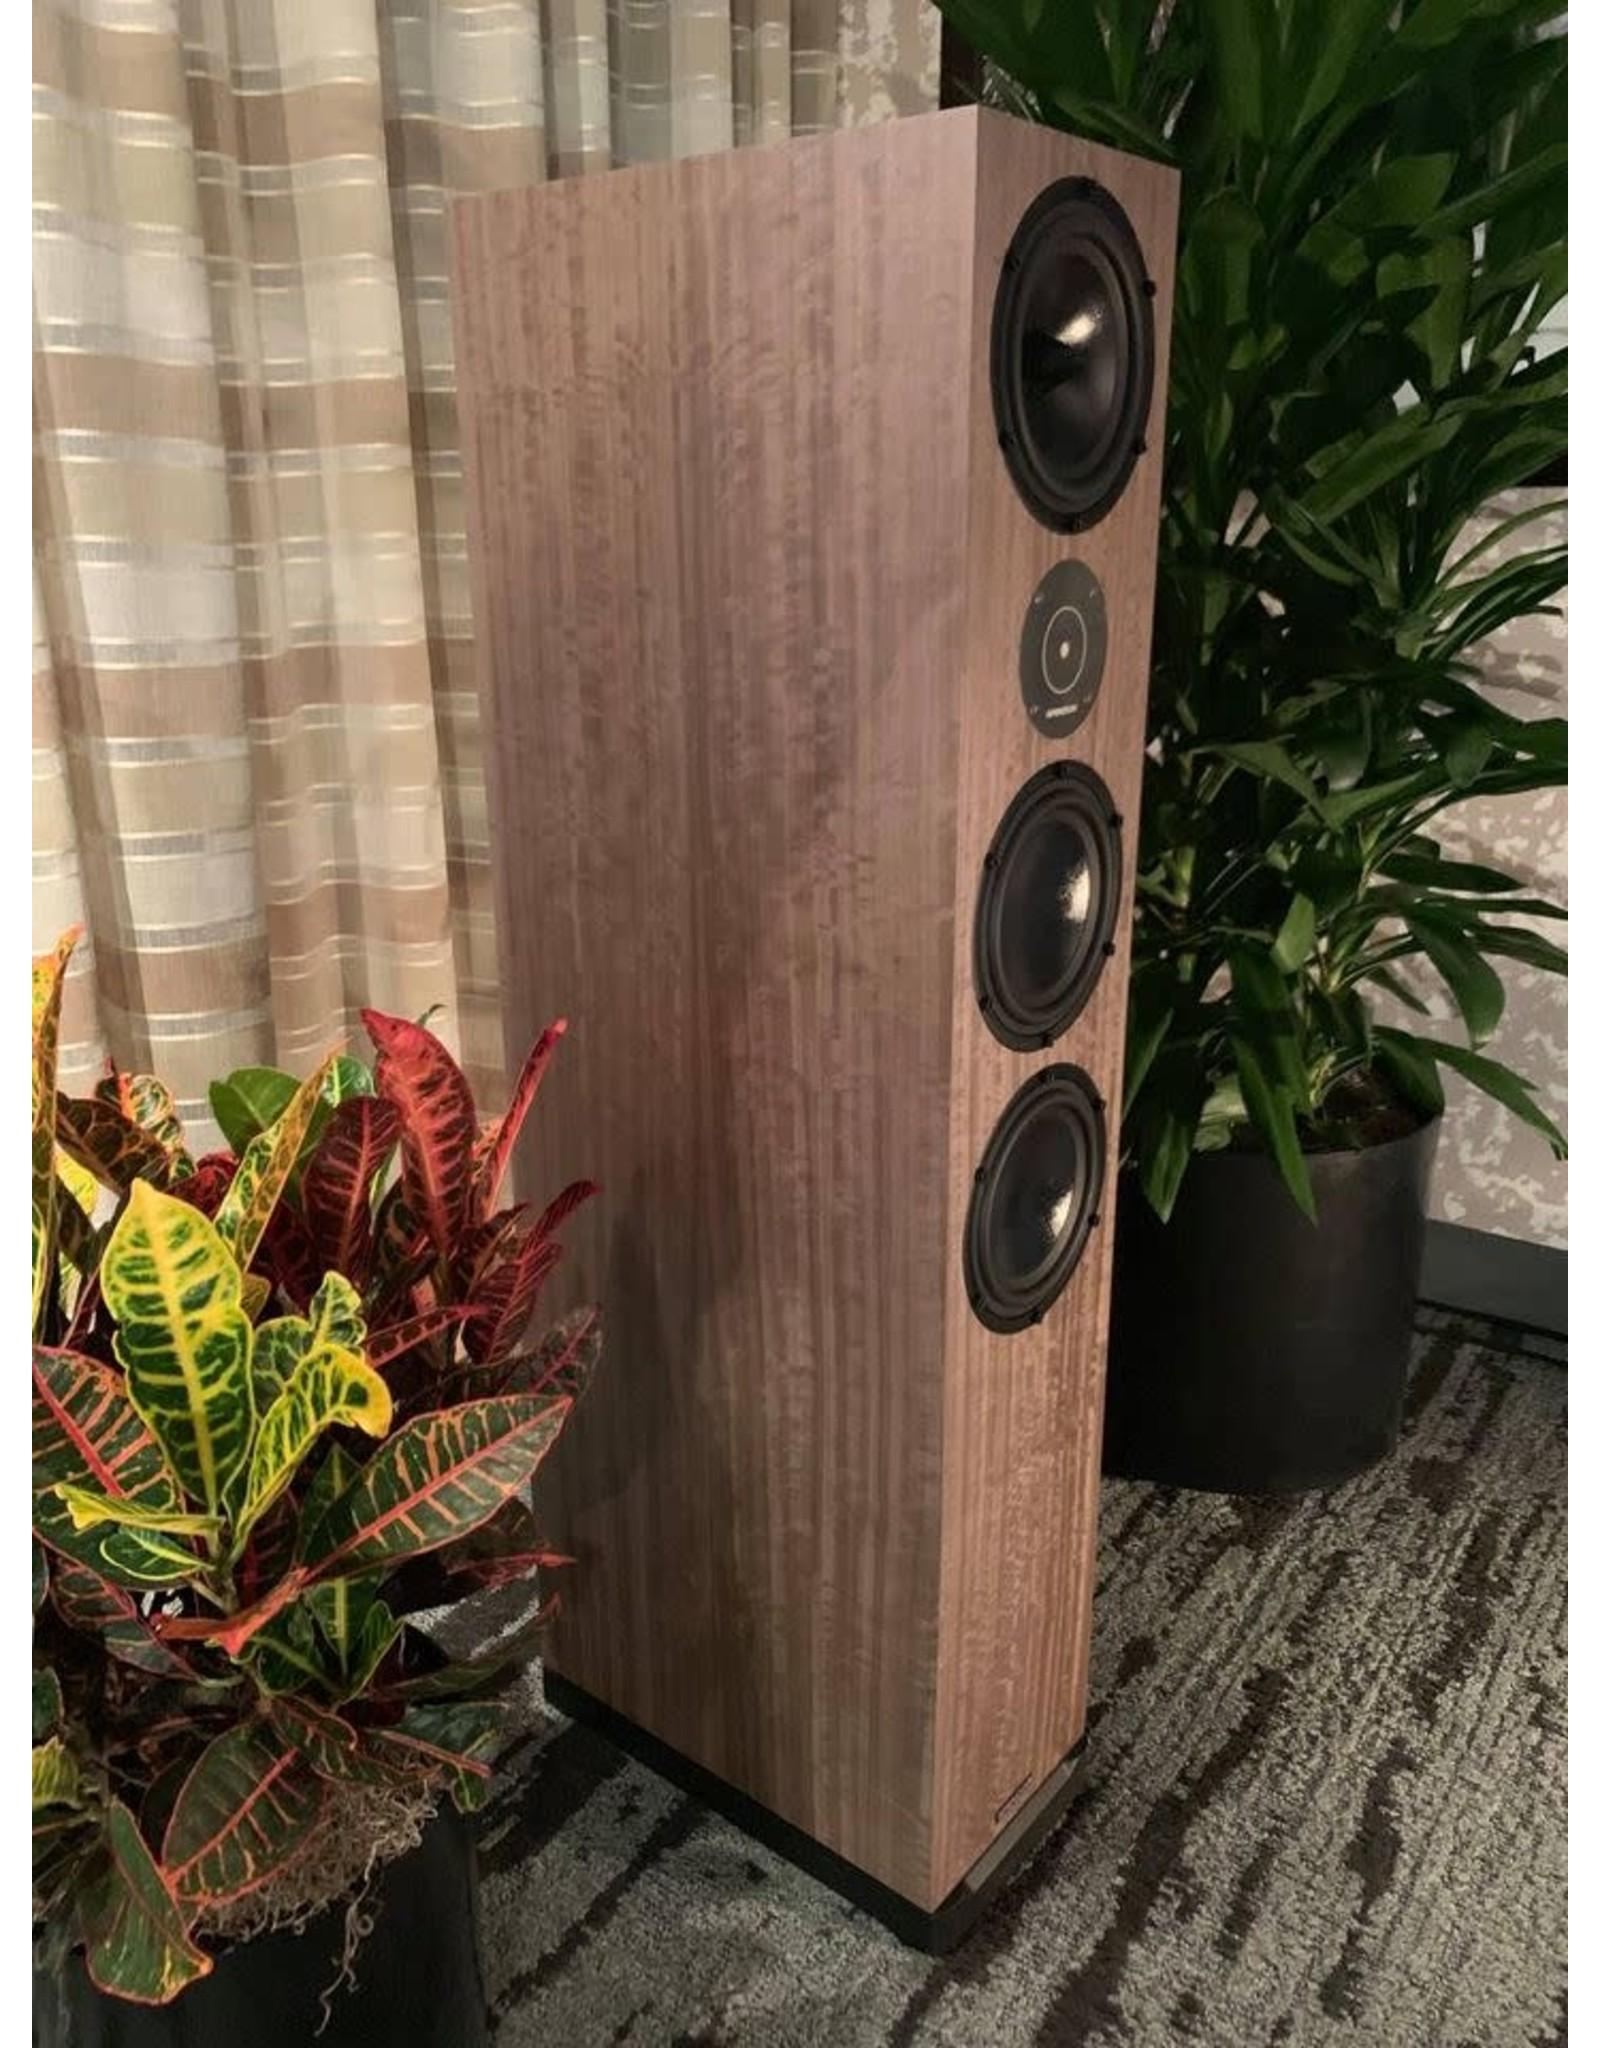 Spendor Spendor D9.2 Floorstanding Speakers Limited Eucalyptus EX-DEMO